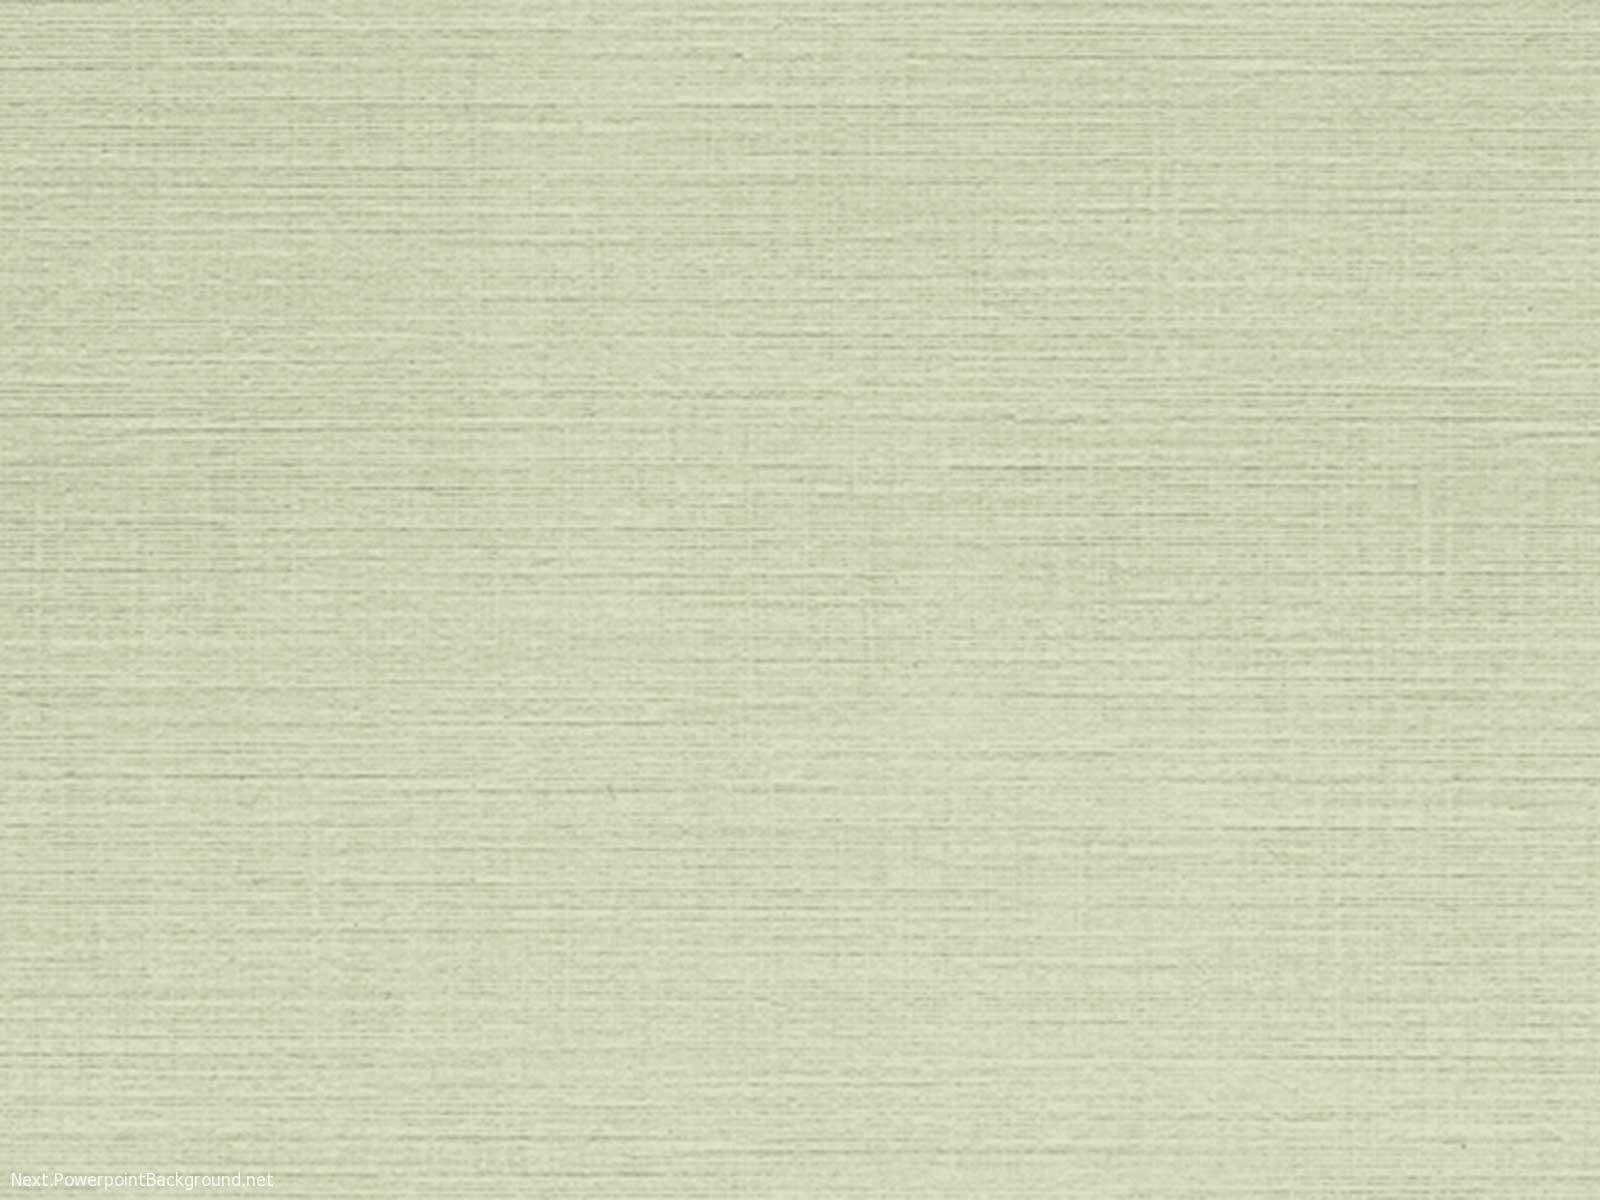 green-linen-paper-texture-powerpoint-background